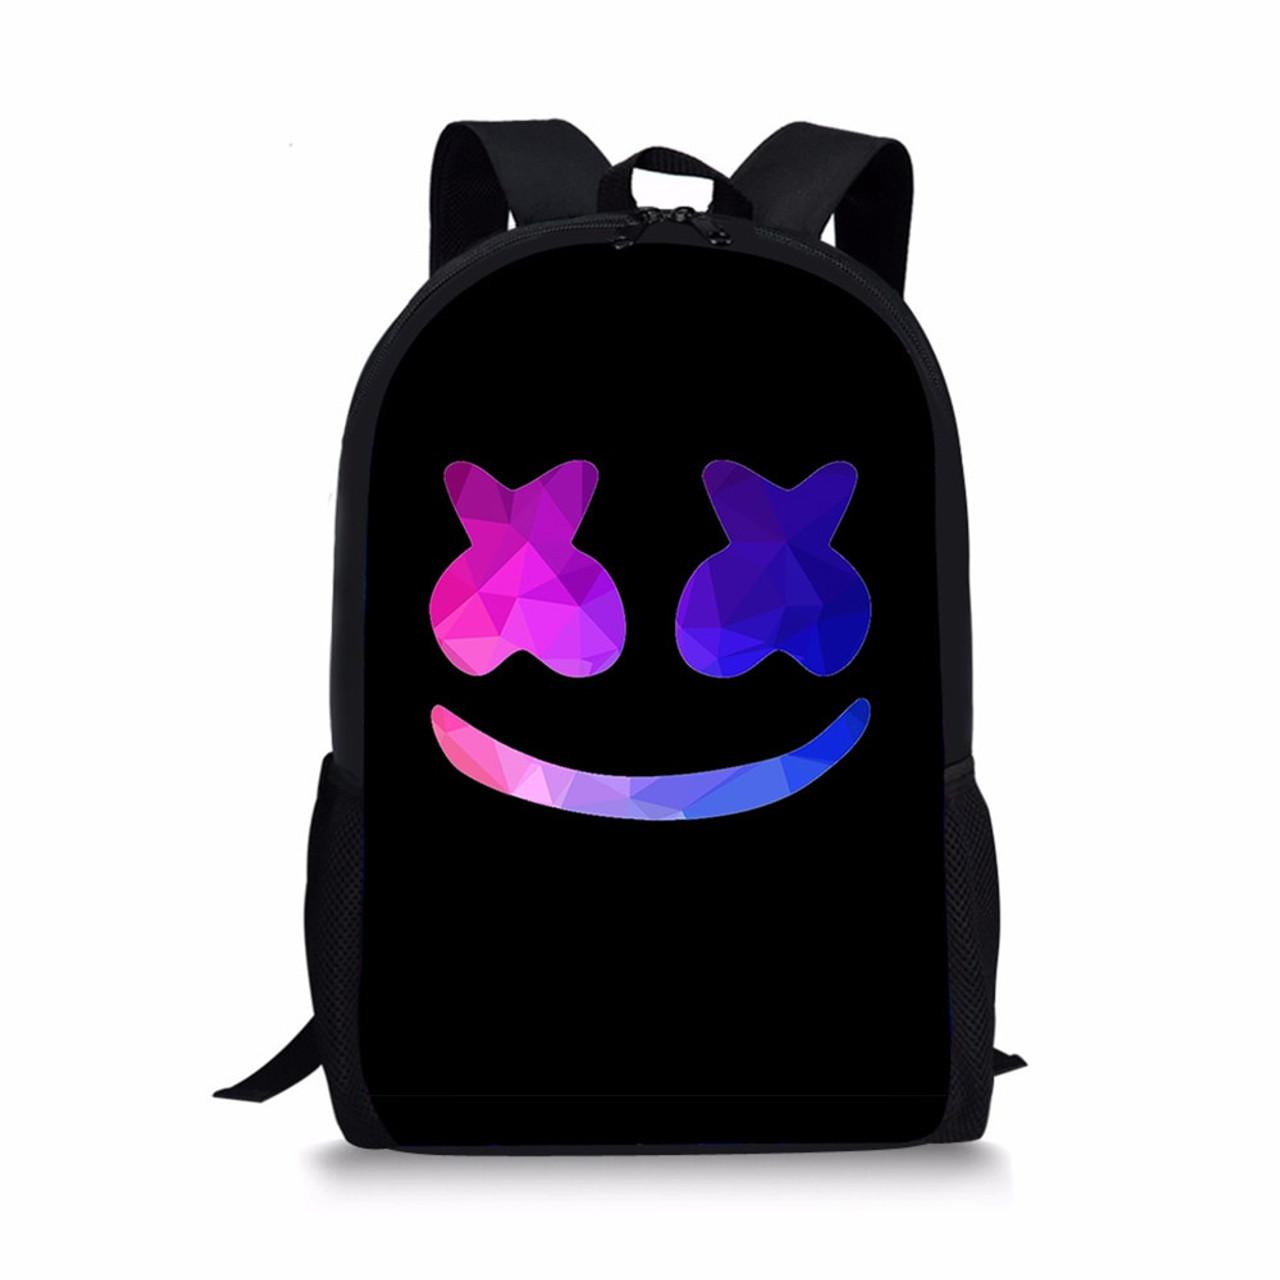 8f0f32123b9 Noisydesigns marshmello fashion backpack boys schoolbags child mochila bag  kids back pack infantil school bags small dj helmet